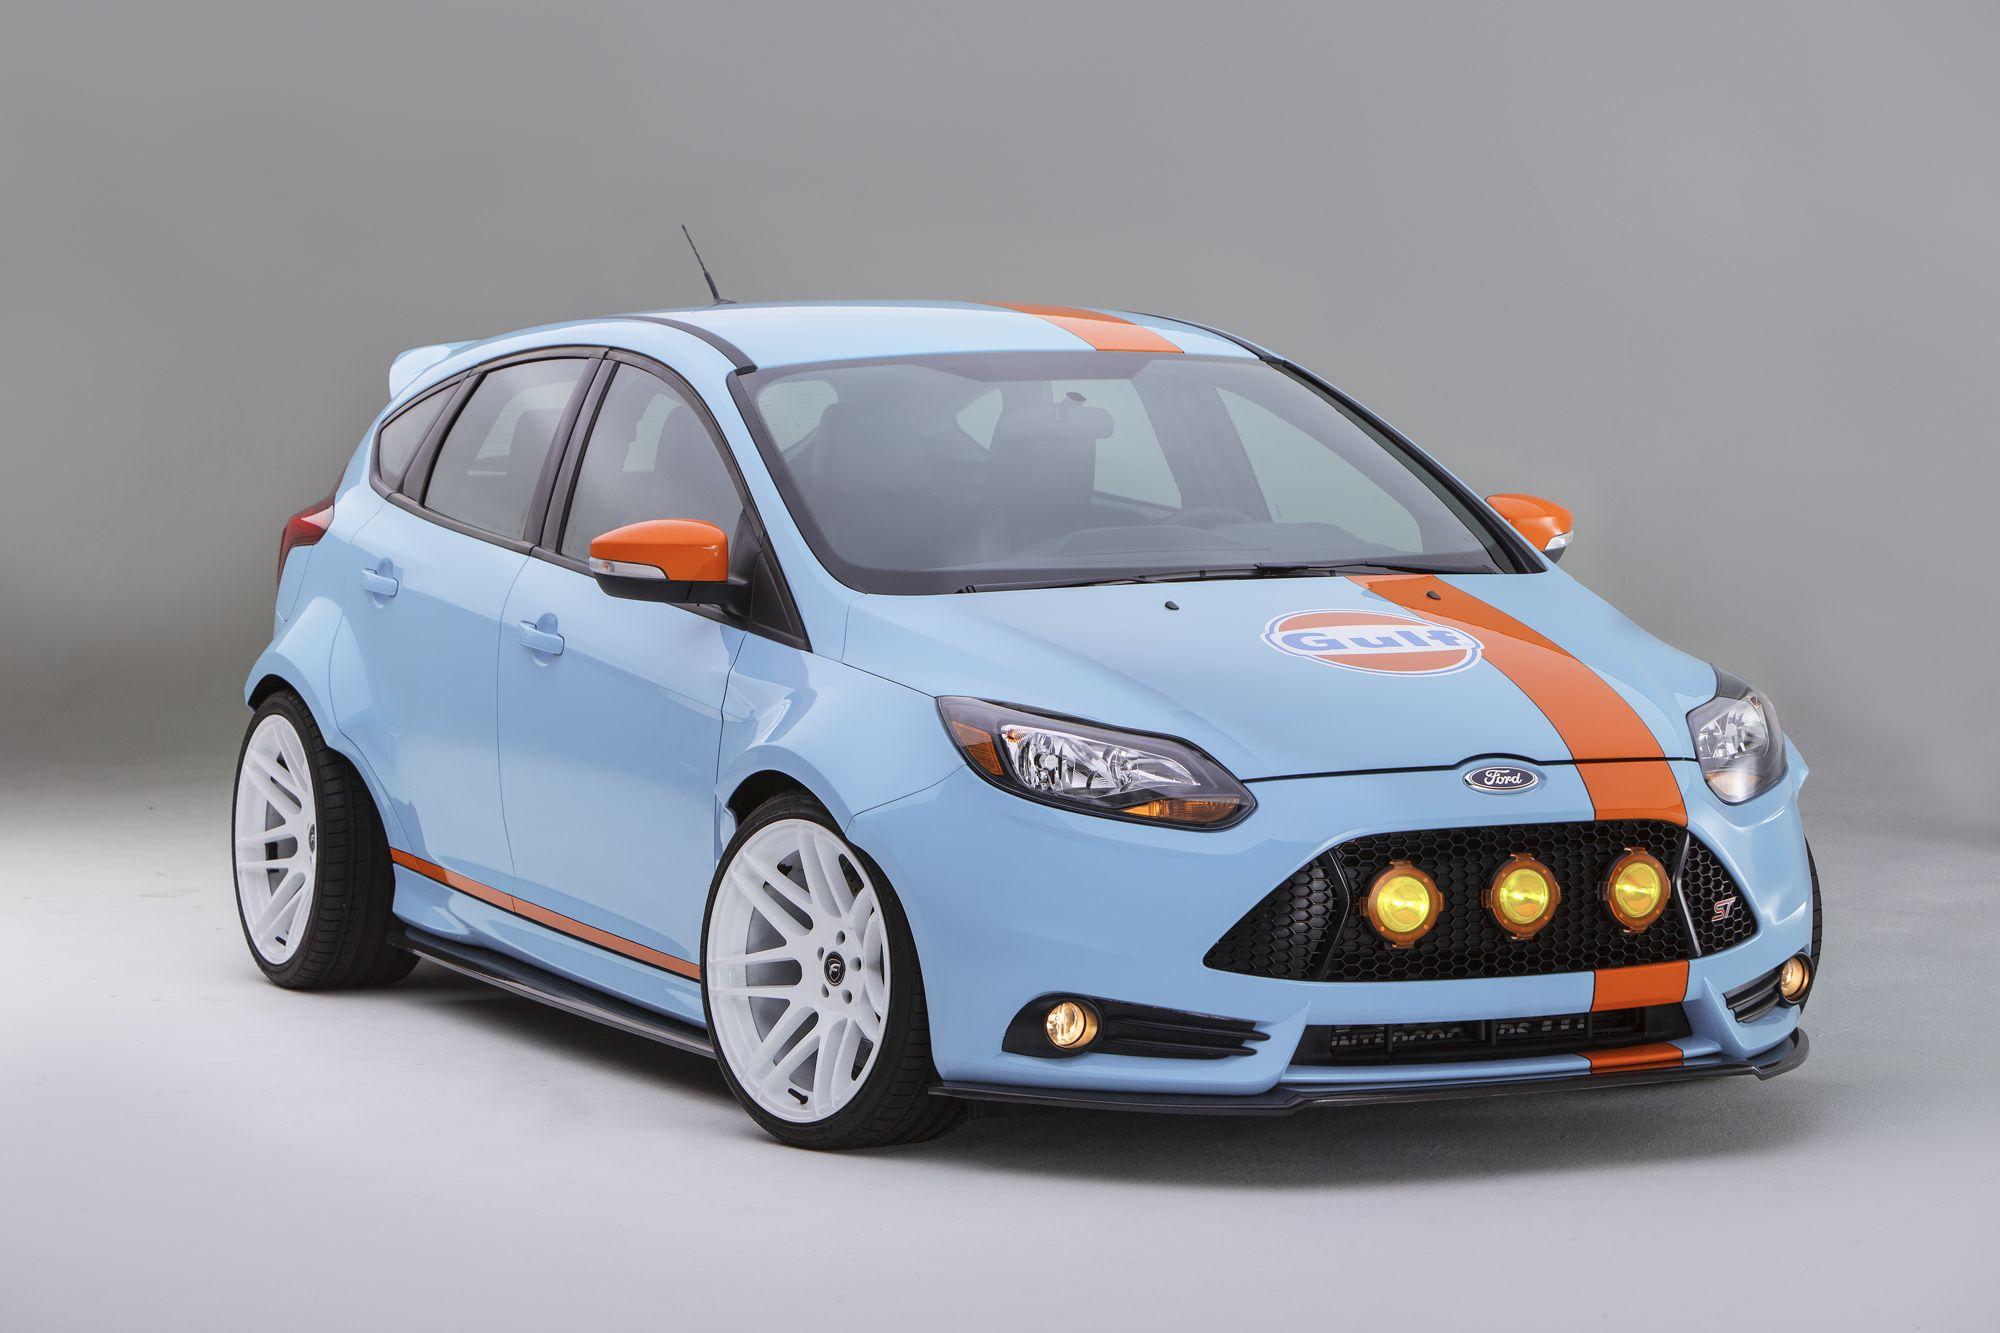 2014 Tjin Edition Ford Focus St Sweepstakes Car Www Uti Edu Focus